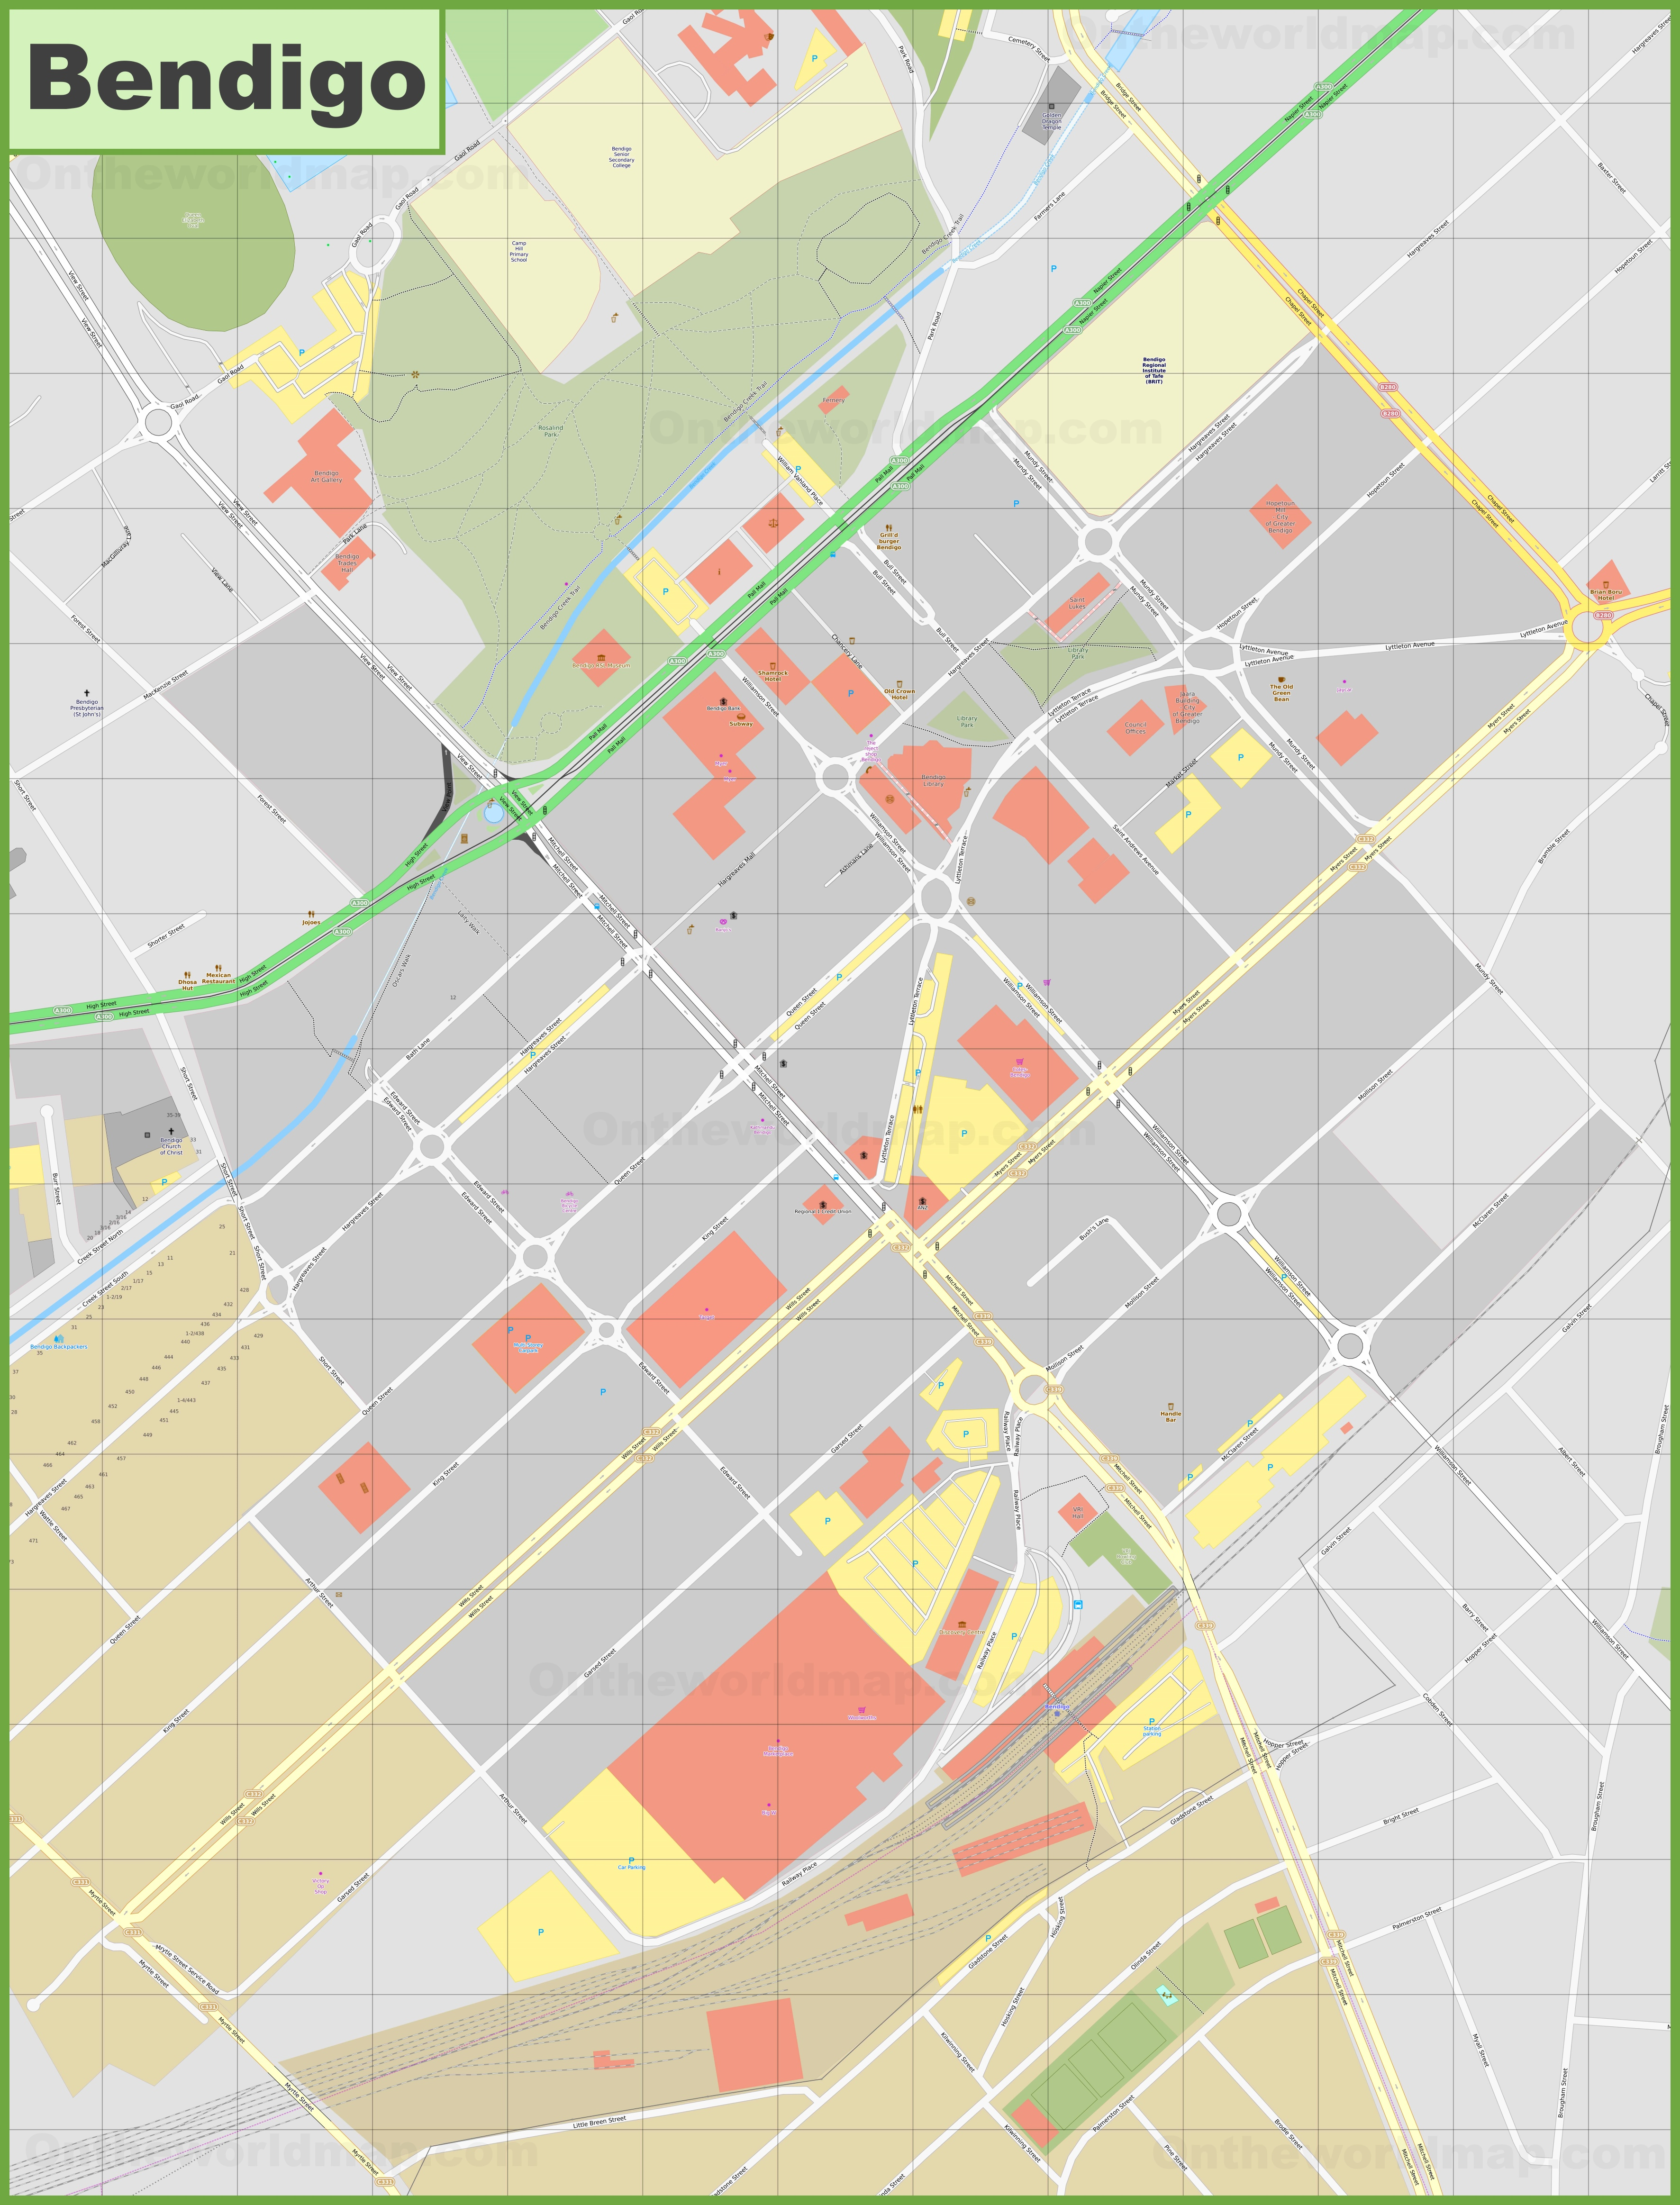 Bendigo CBD map